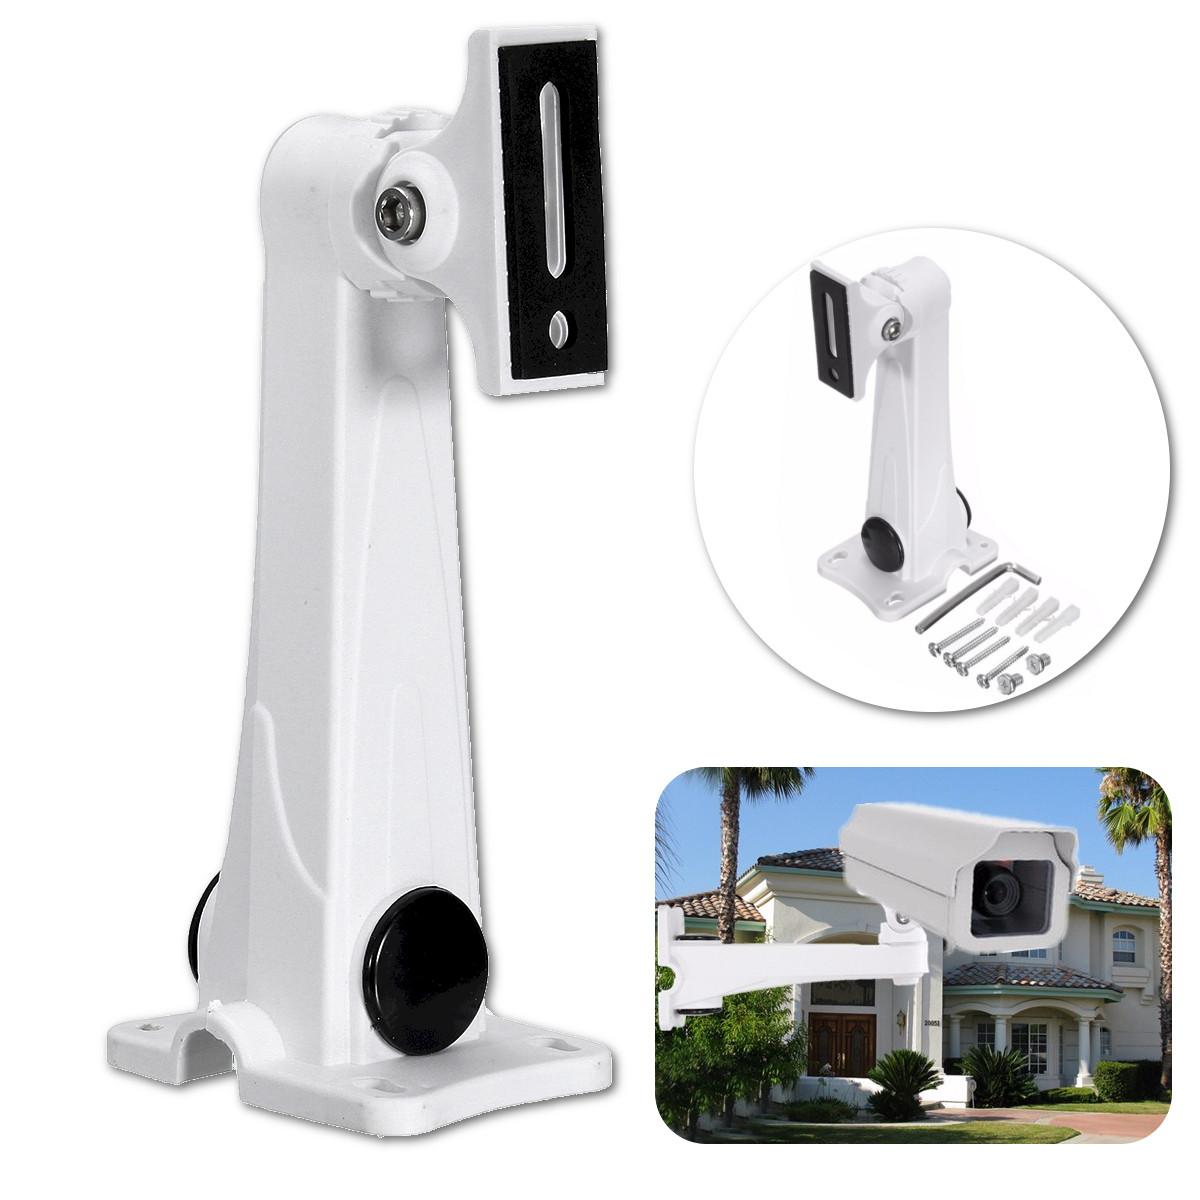 ZSX-608S Wall Mount Bracket Indoor Outdoor Home Surveillance For CCTV Security Camera